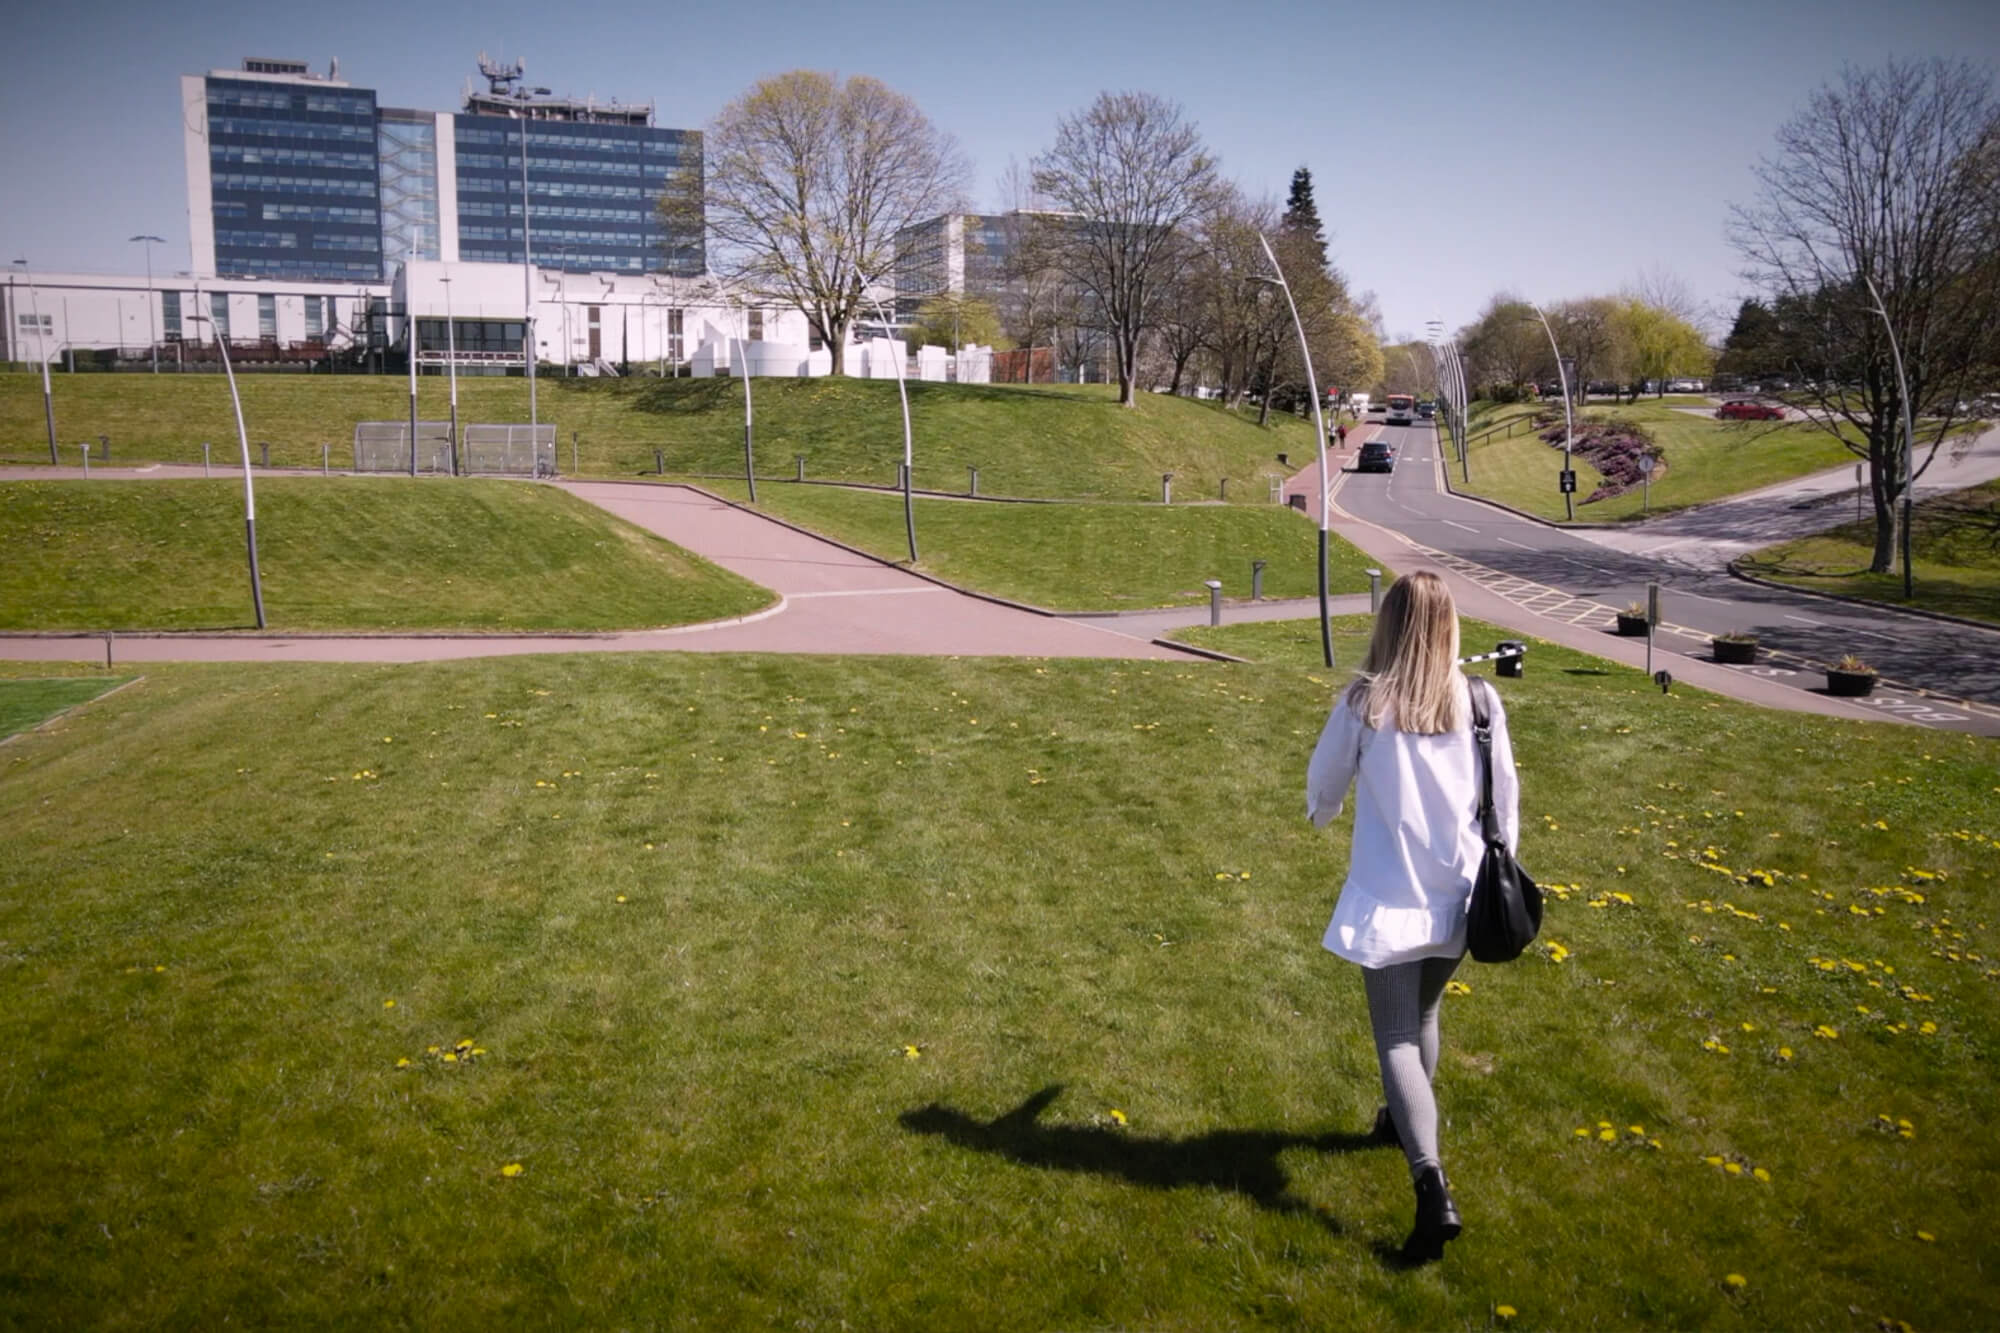 Barbora Horackova walking across the grass at Kedleston Road